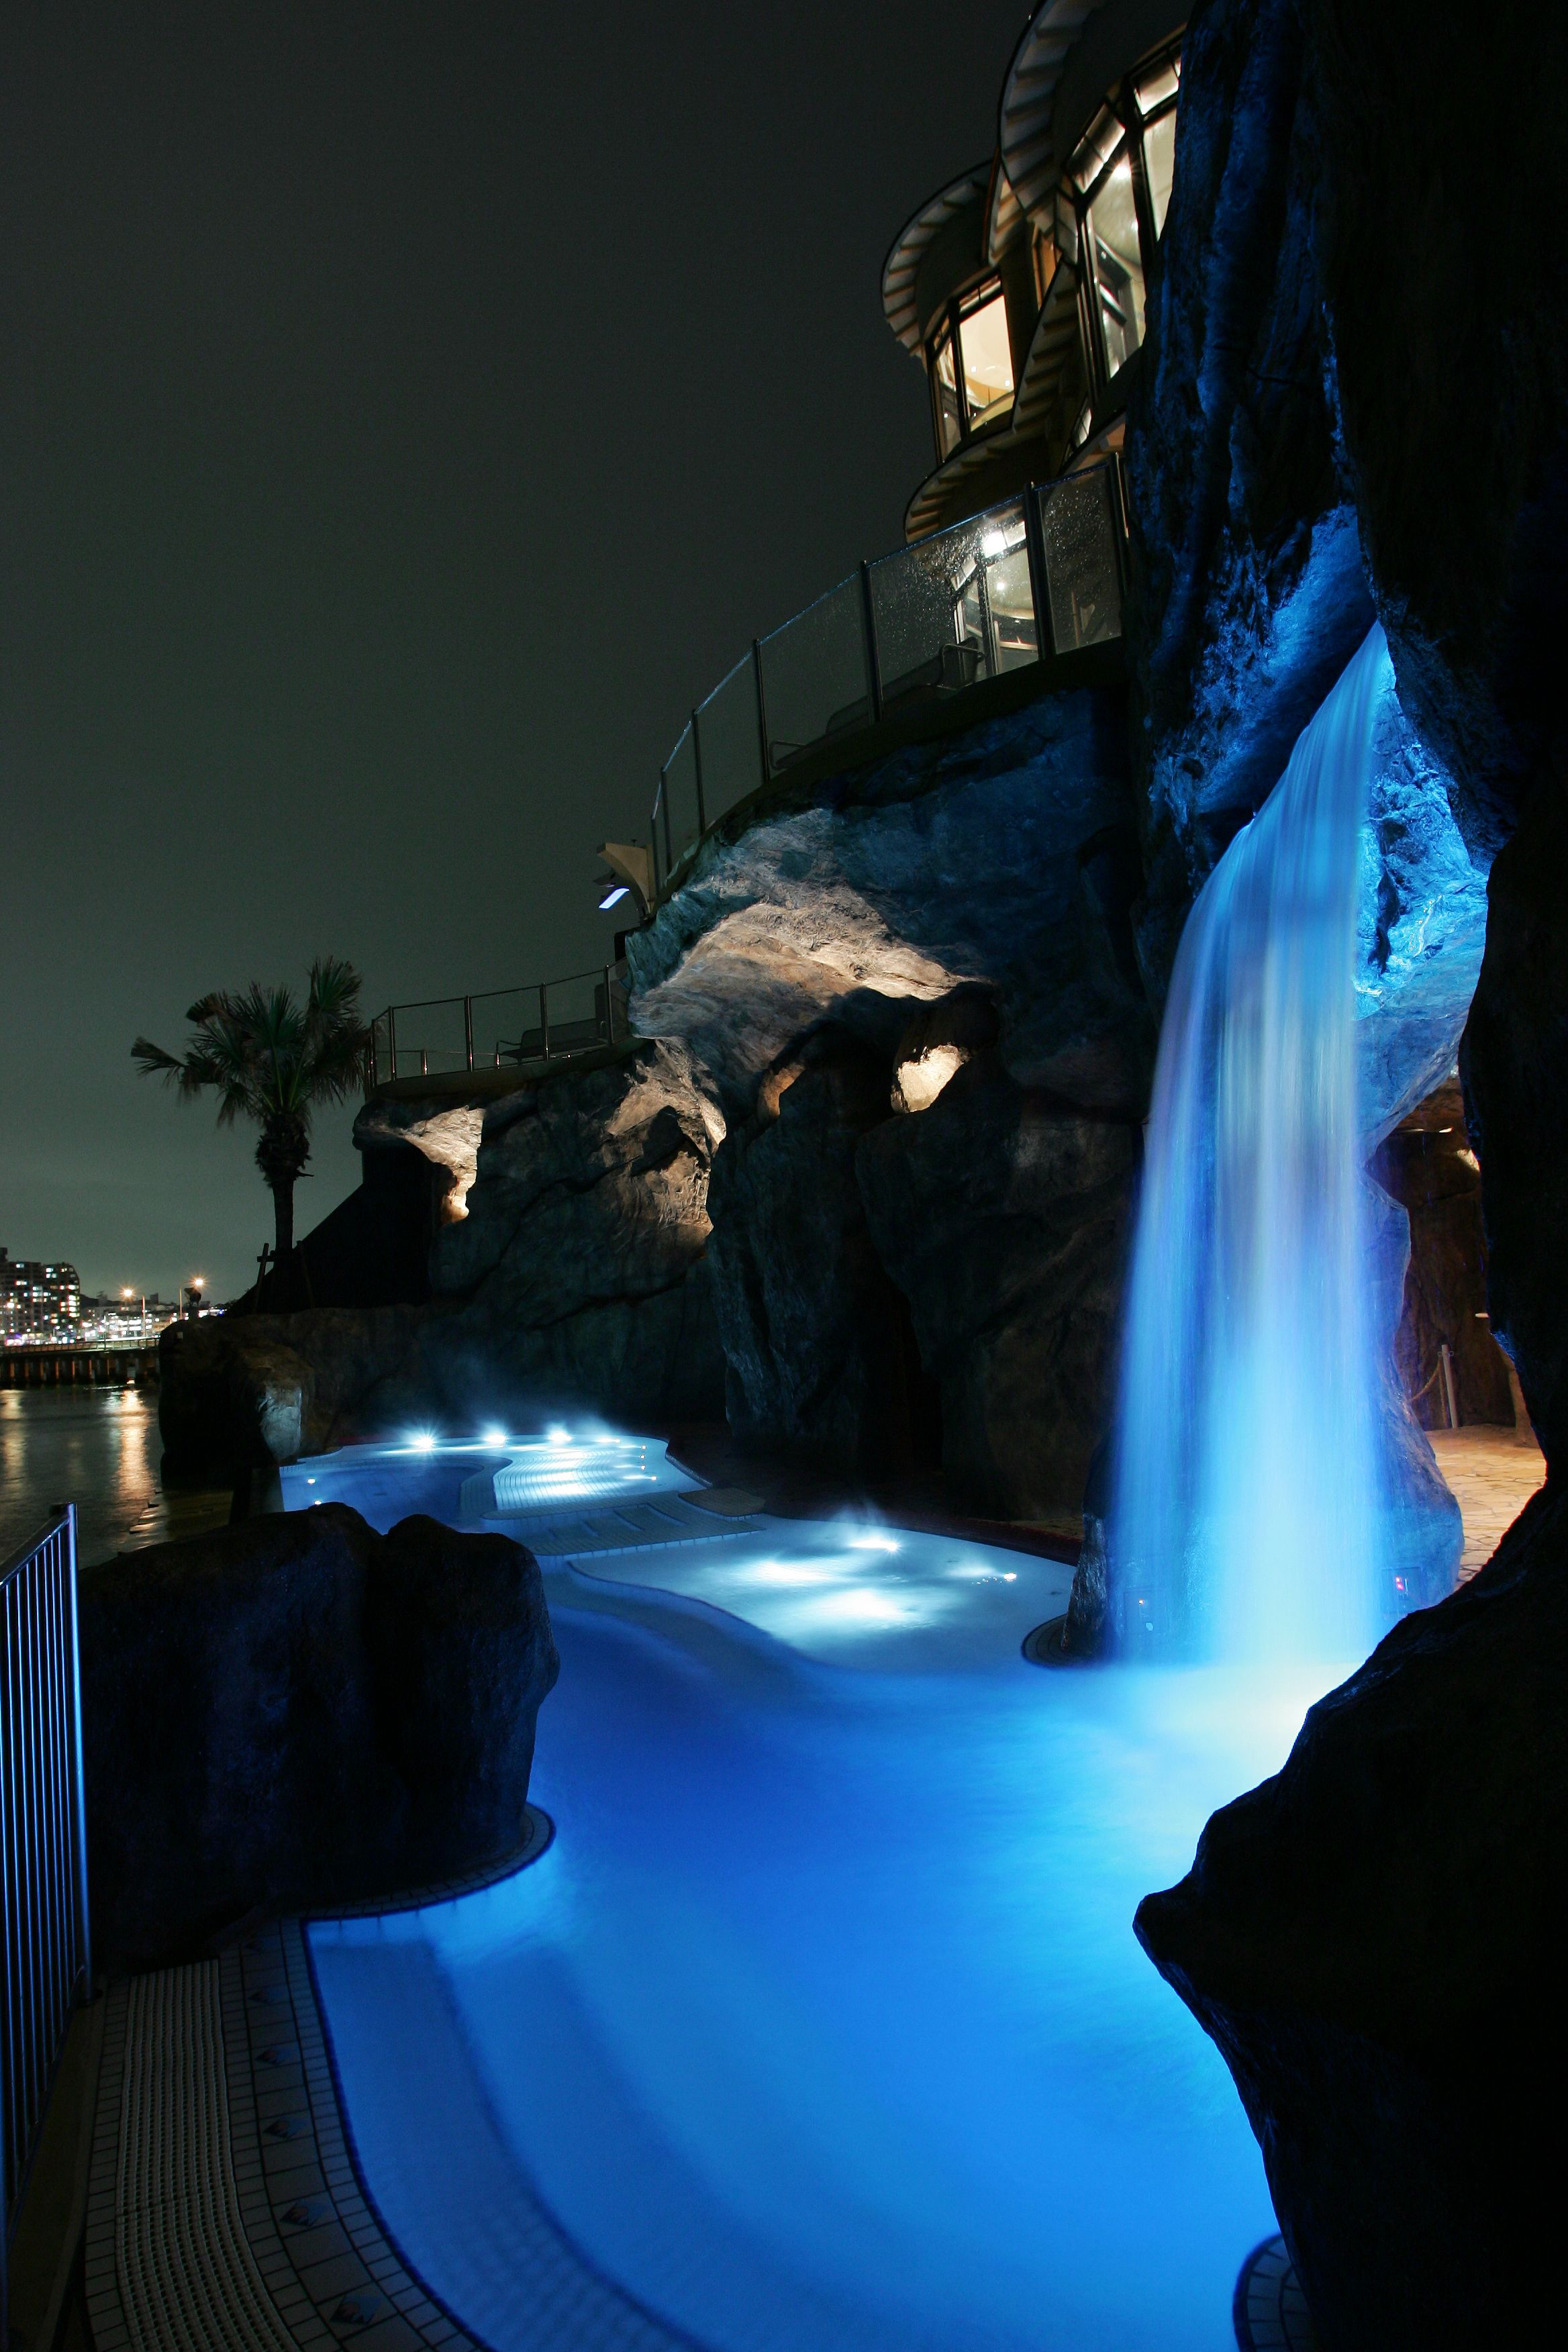 Enoshima Island Spa pool from Enoshima - \